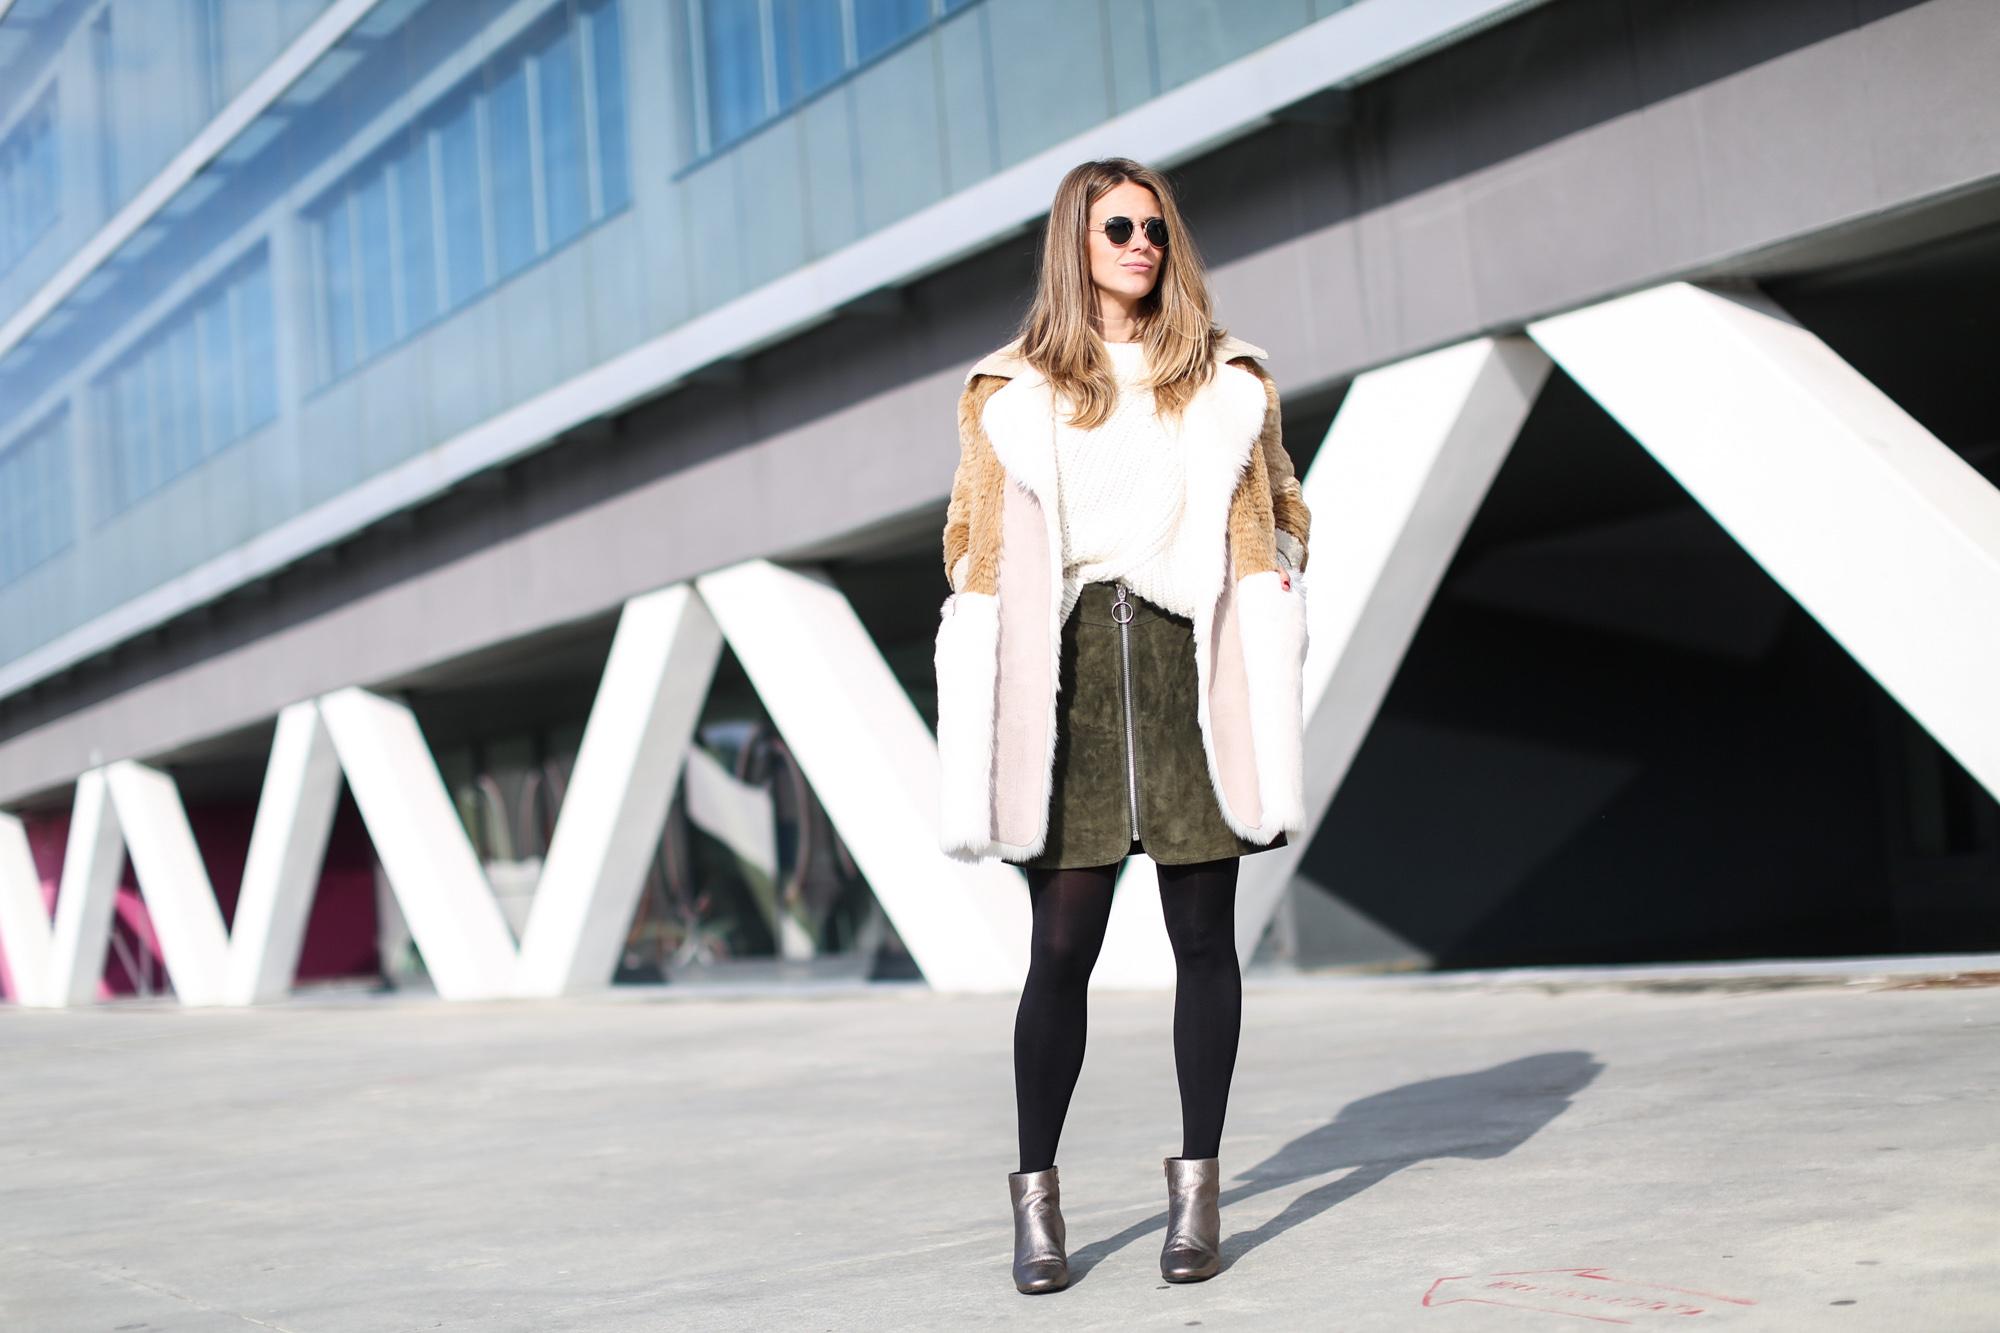 Clochet_streetstyle_fashionblogger_asosfauxfurcoat_minifaldaantezara_botinespieldorados-2